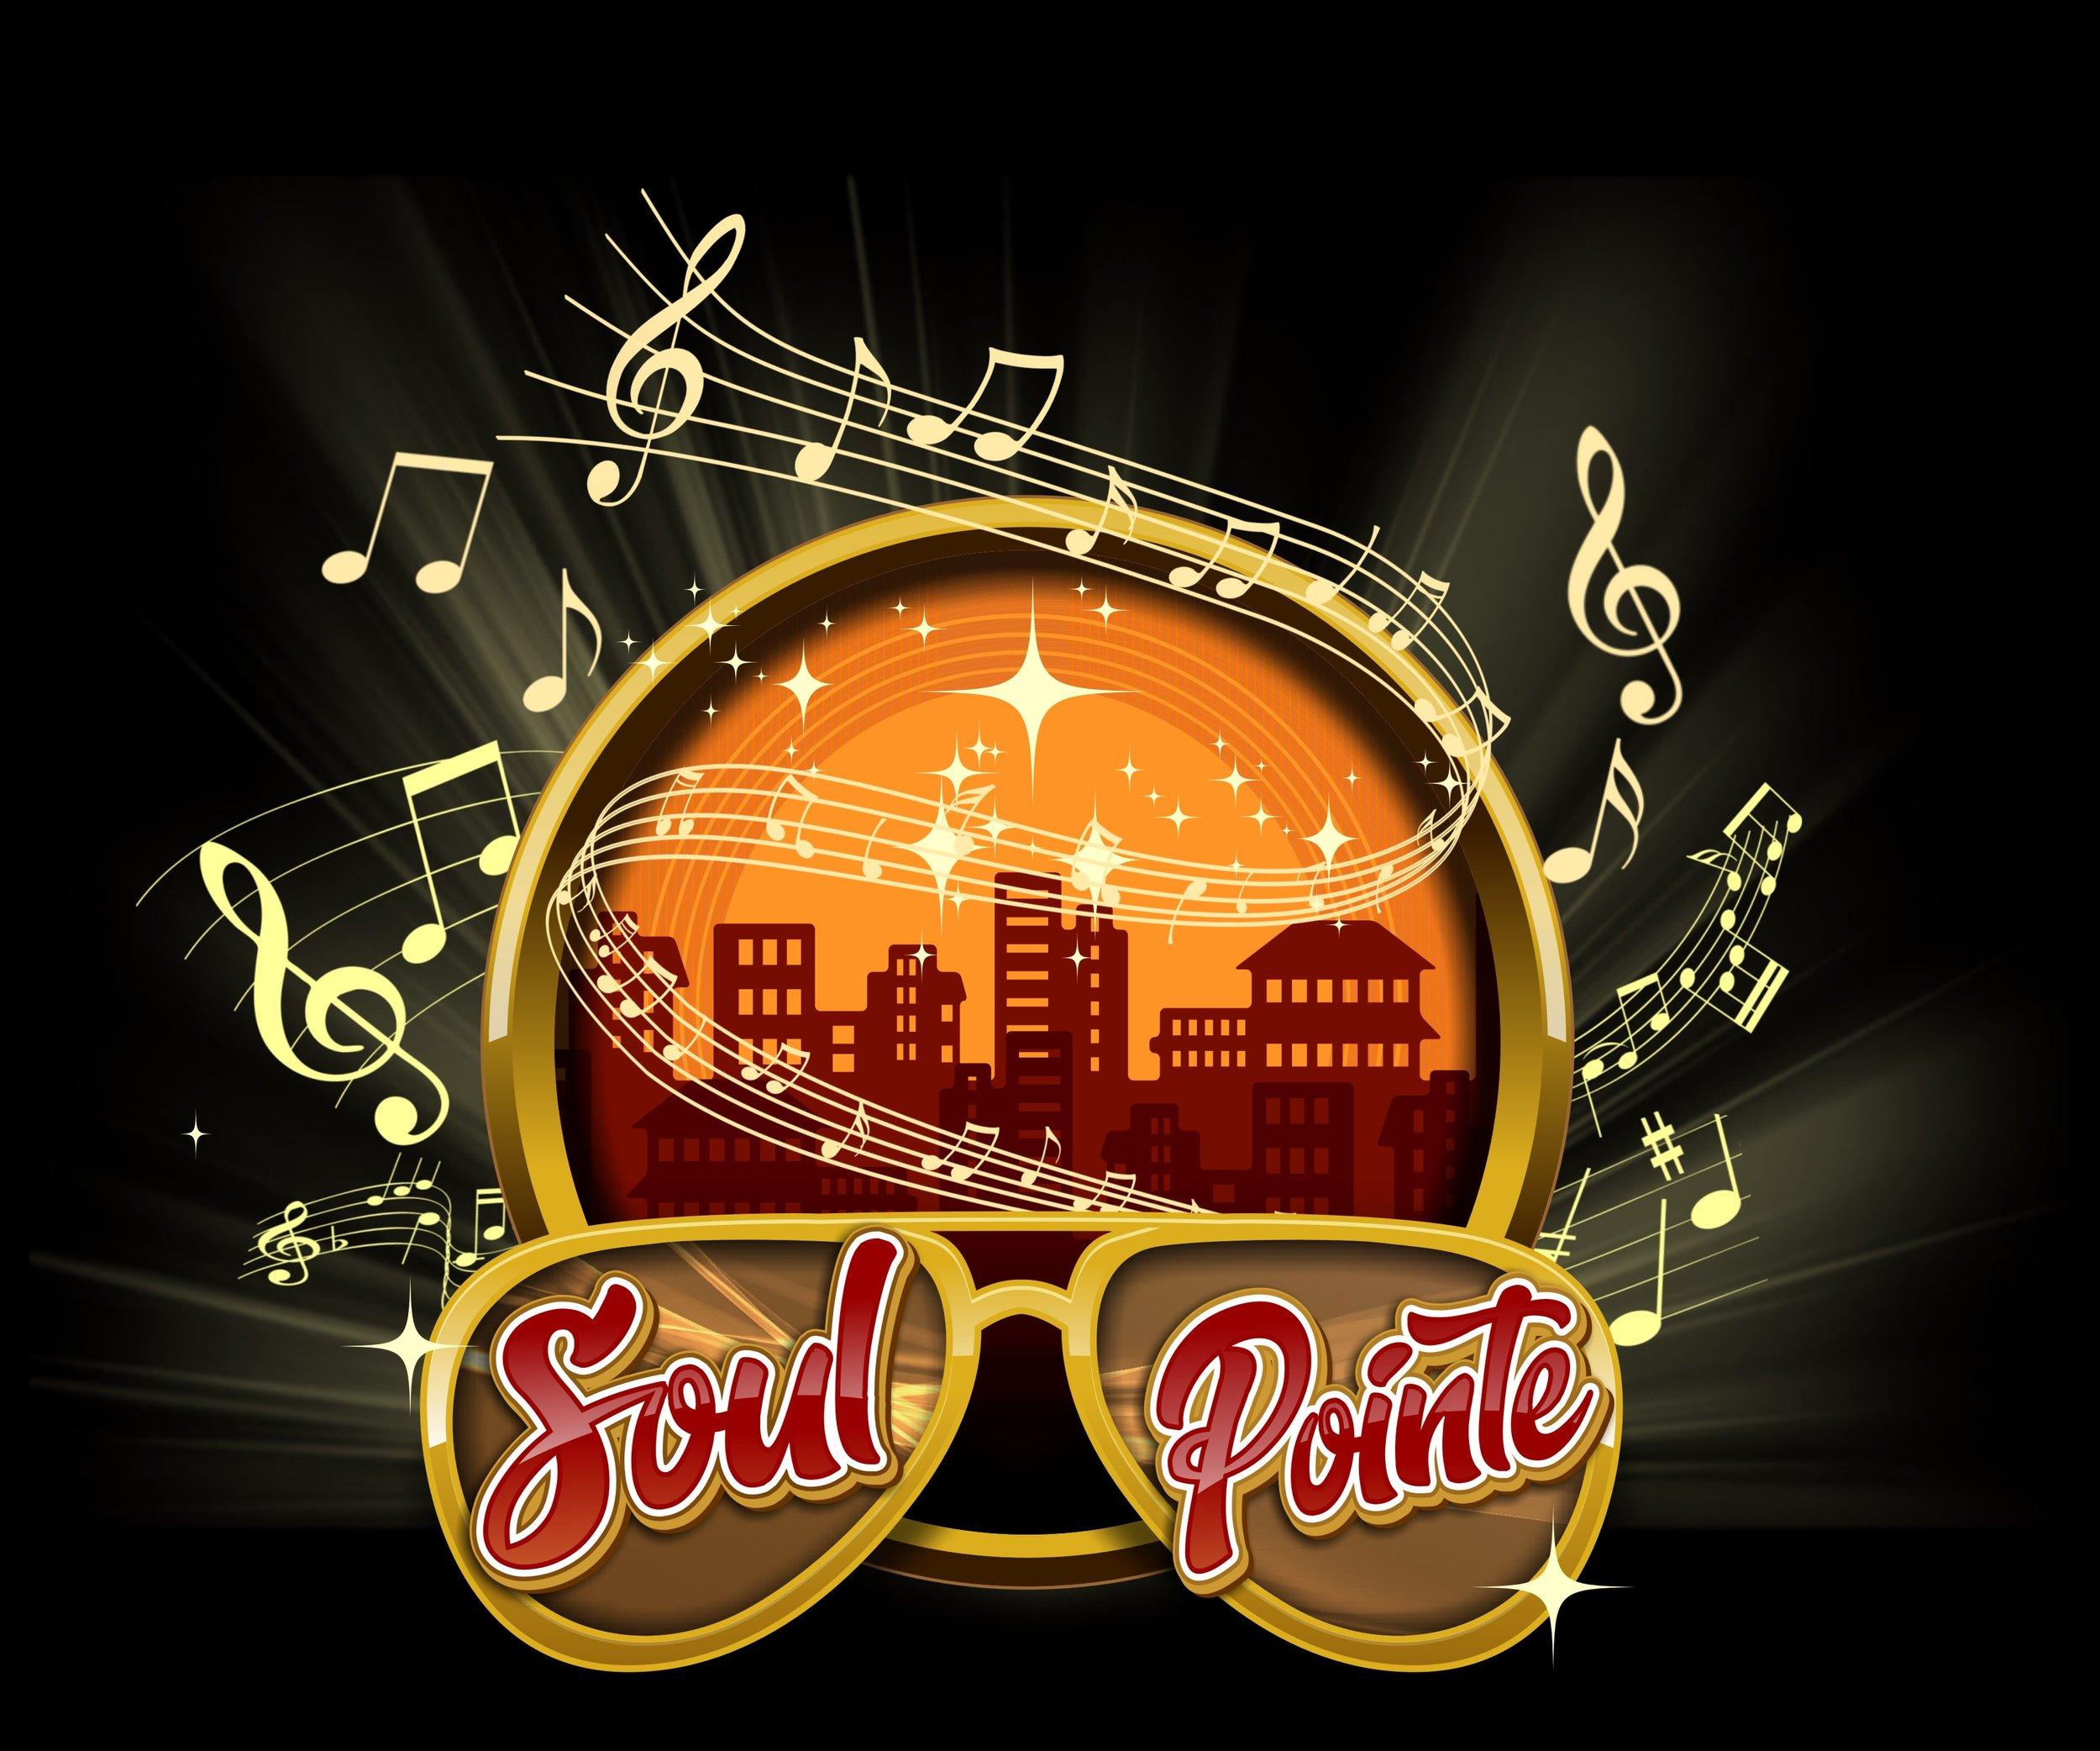 Soul Pointe Logo 2.jpg